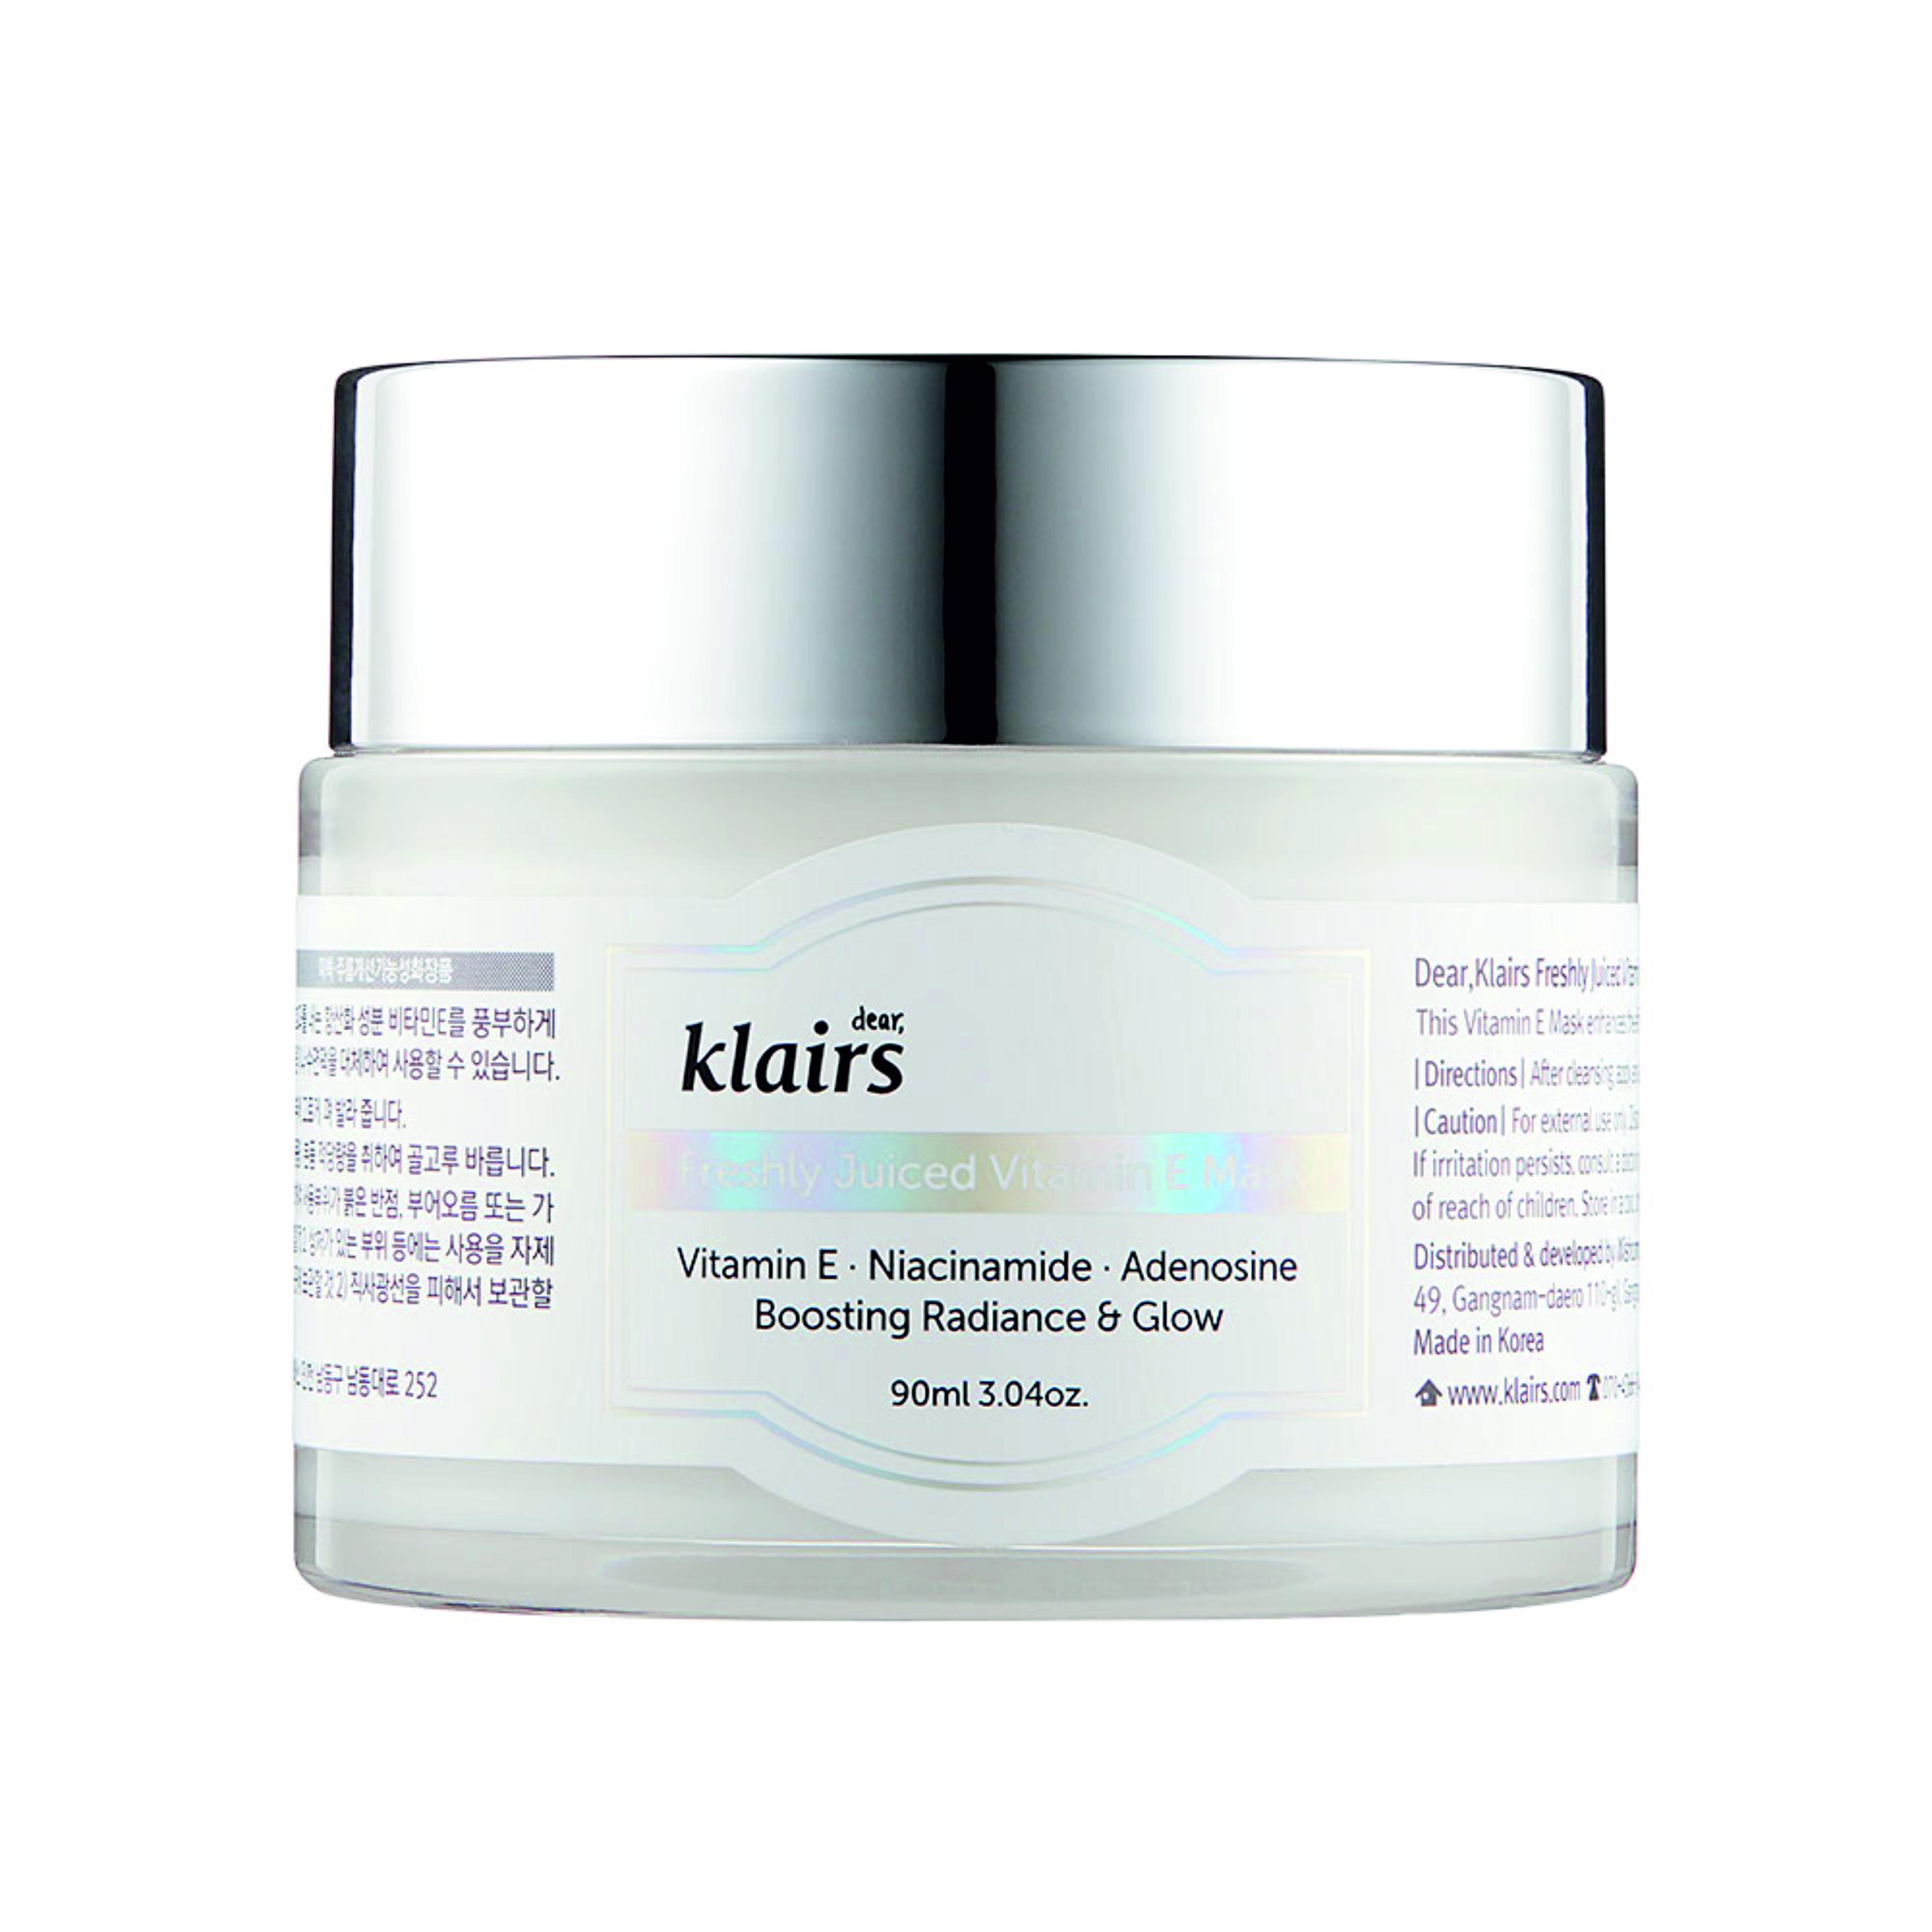 Dear Klairs Freshly Juiced Vitamin E Cream Mask